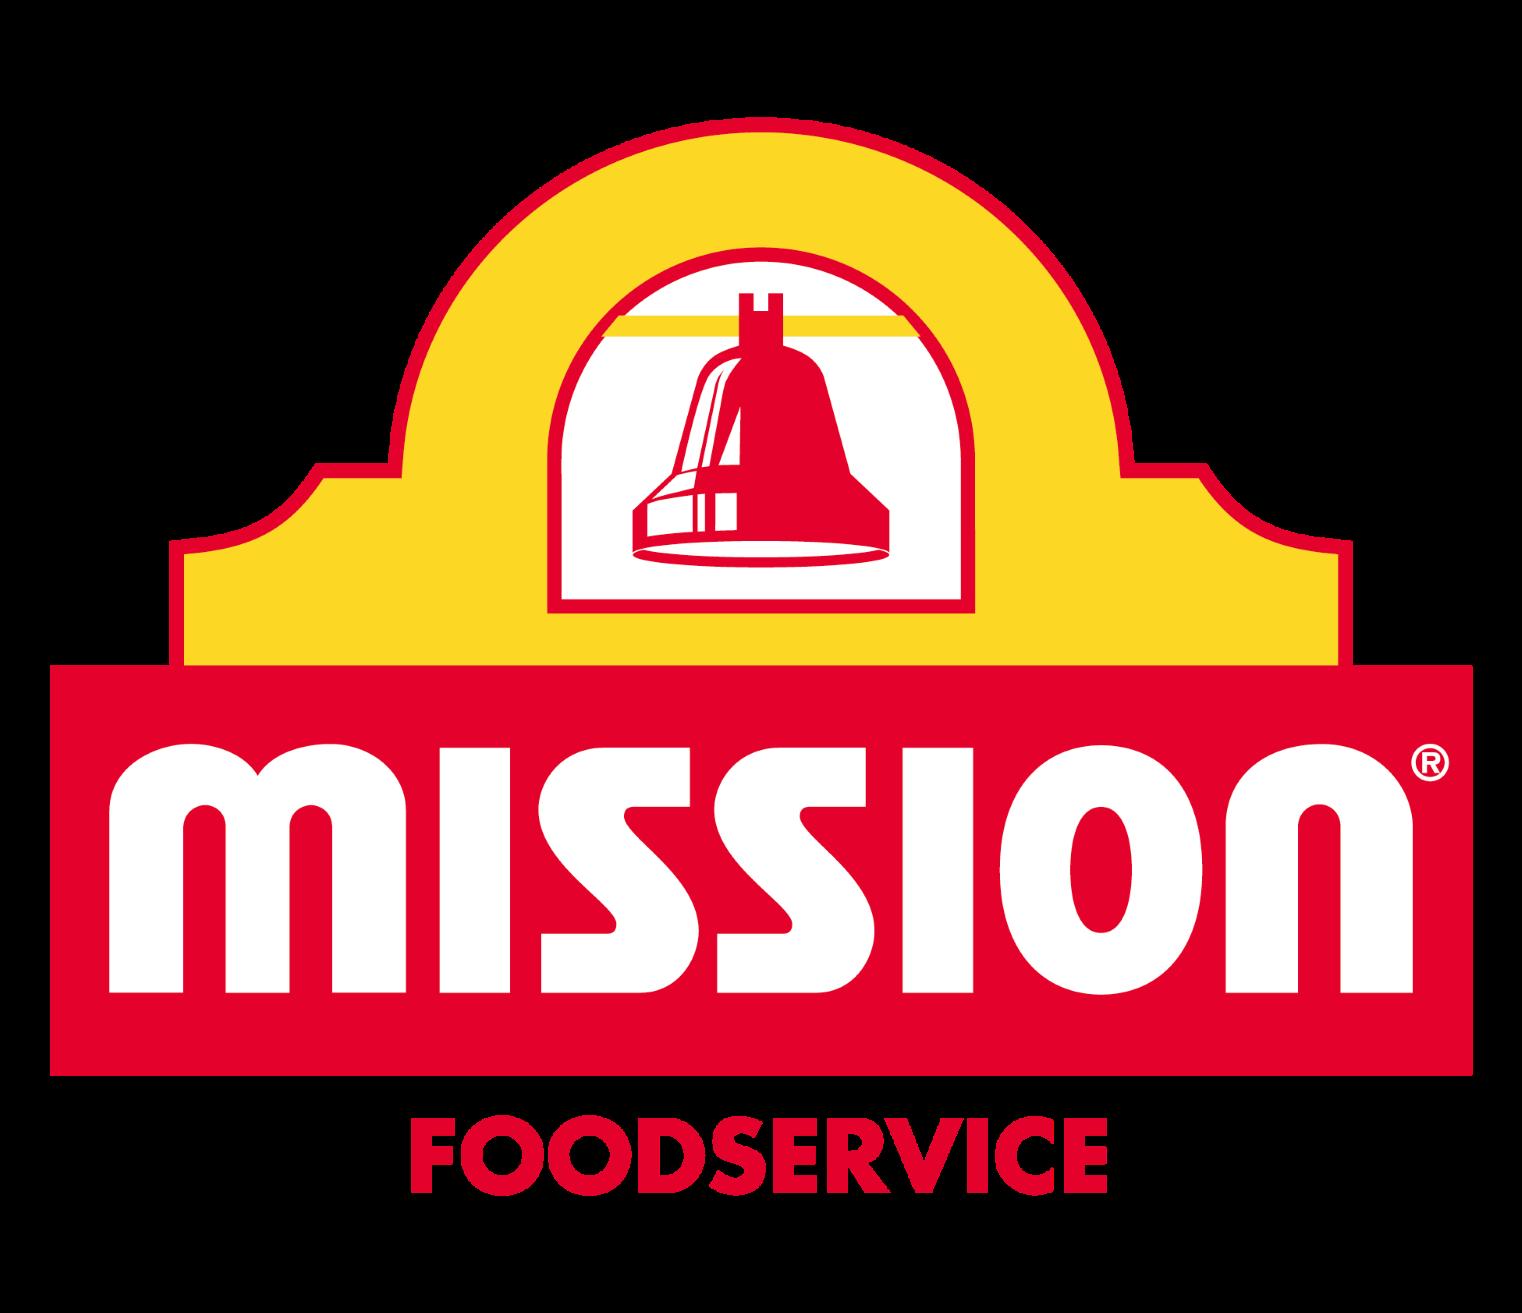 Mission Foodservice logo